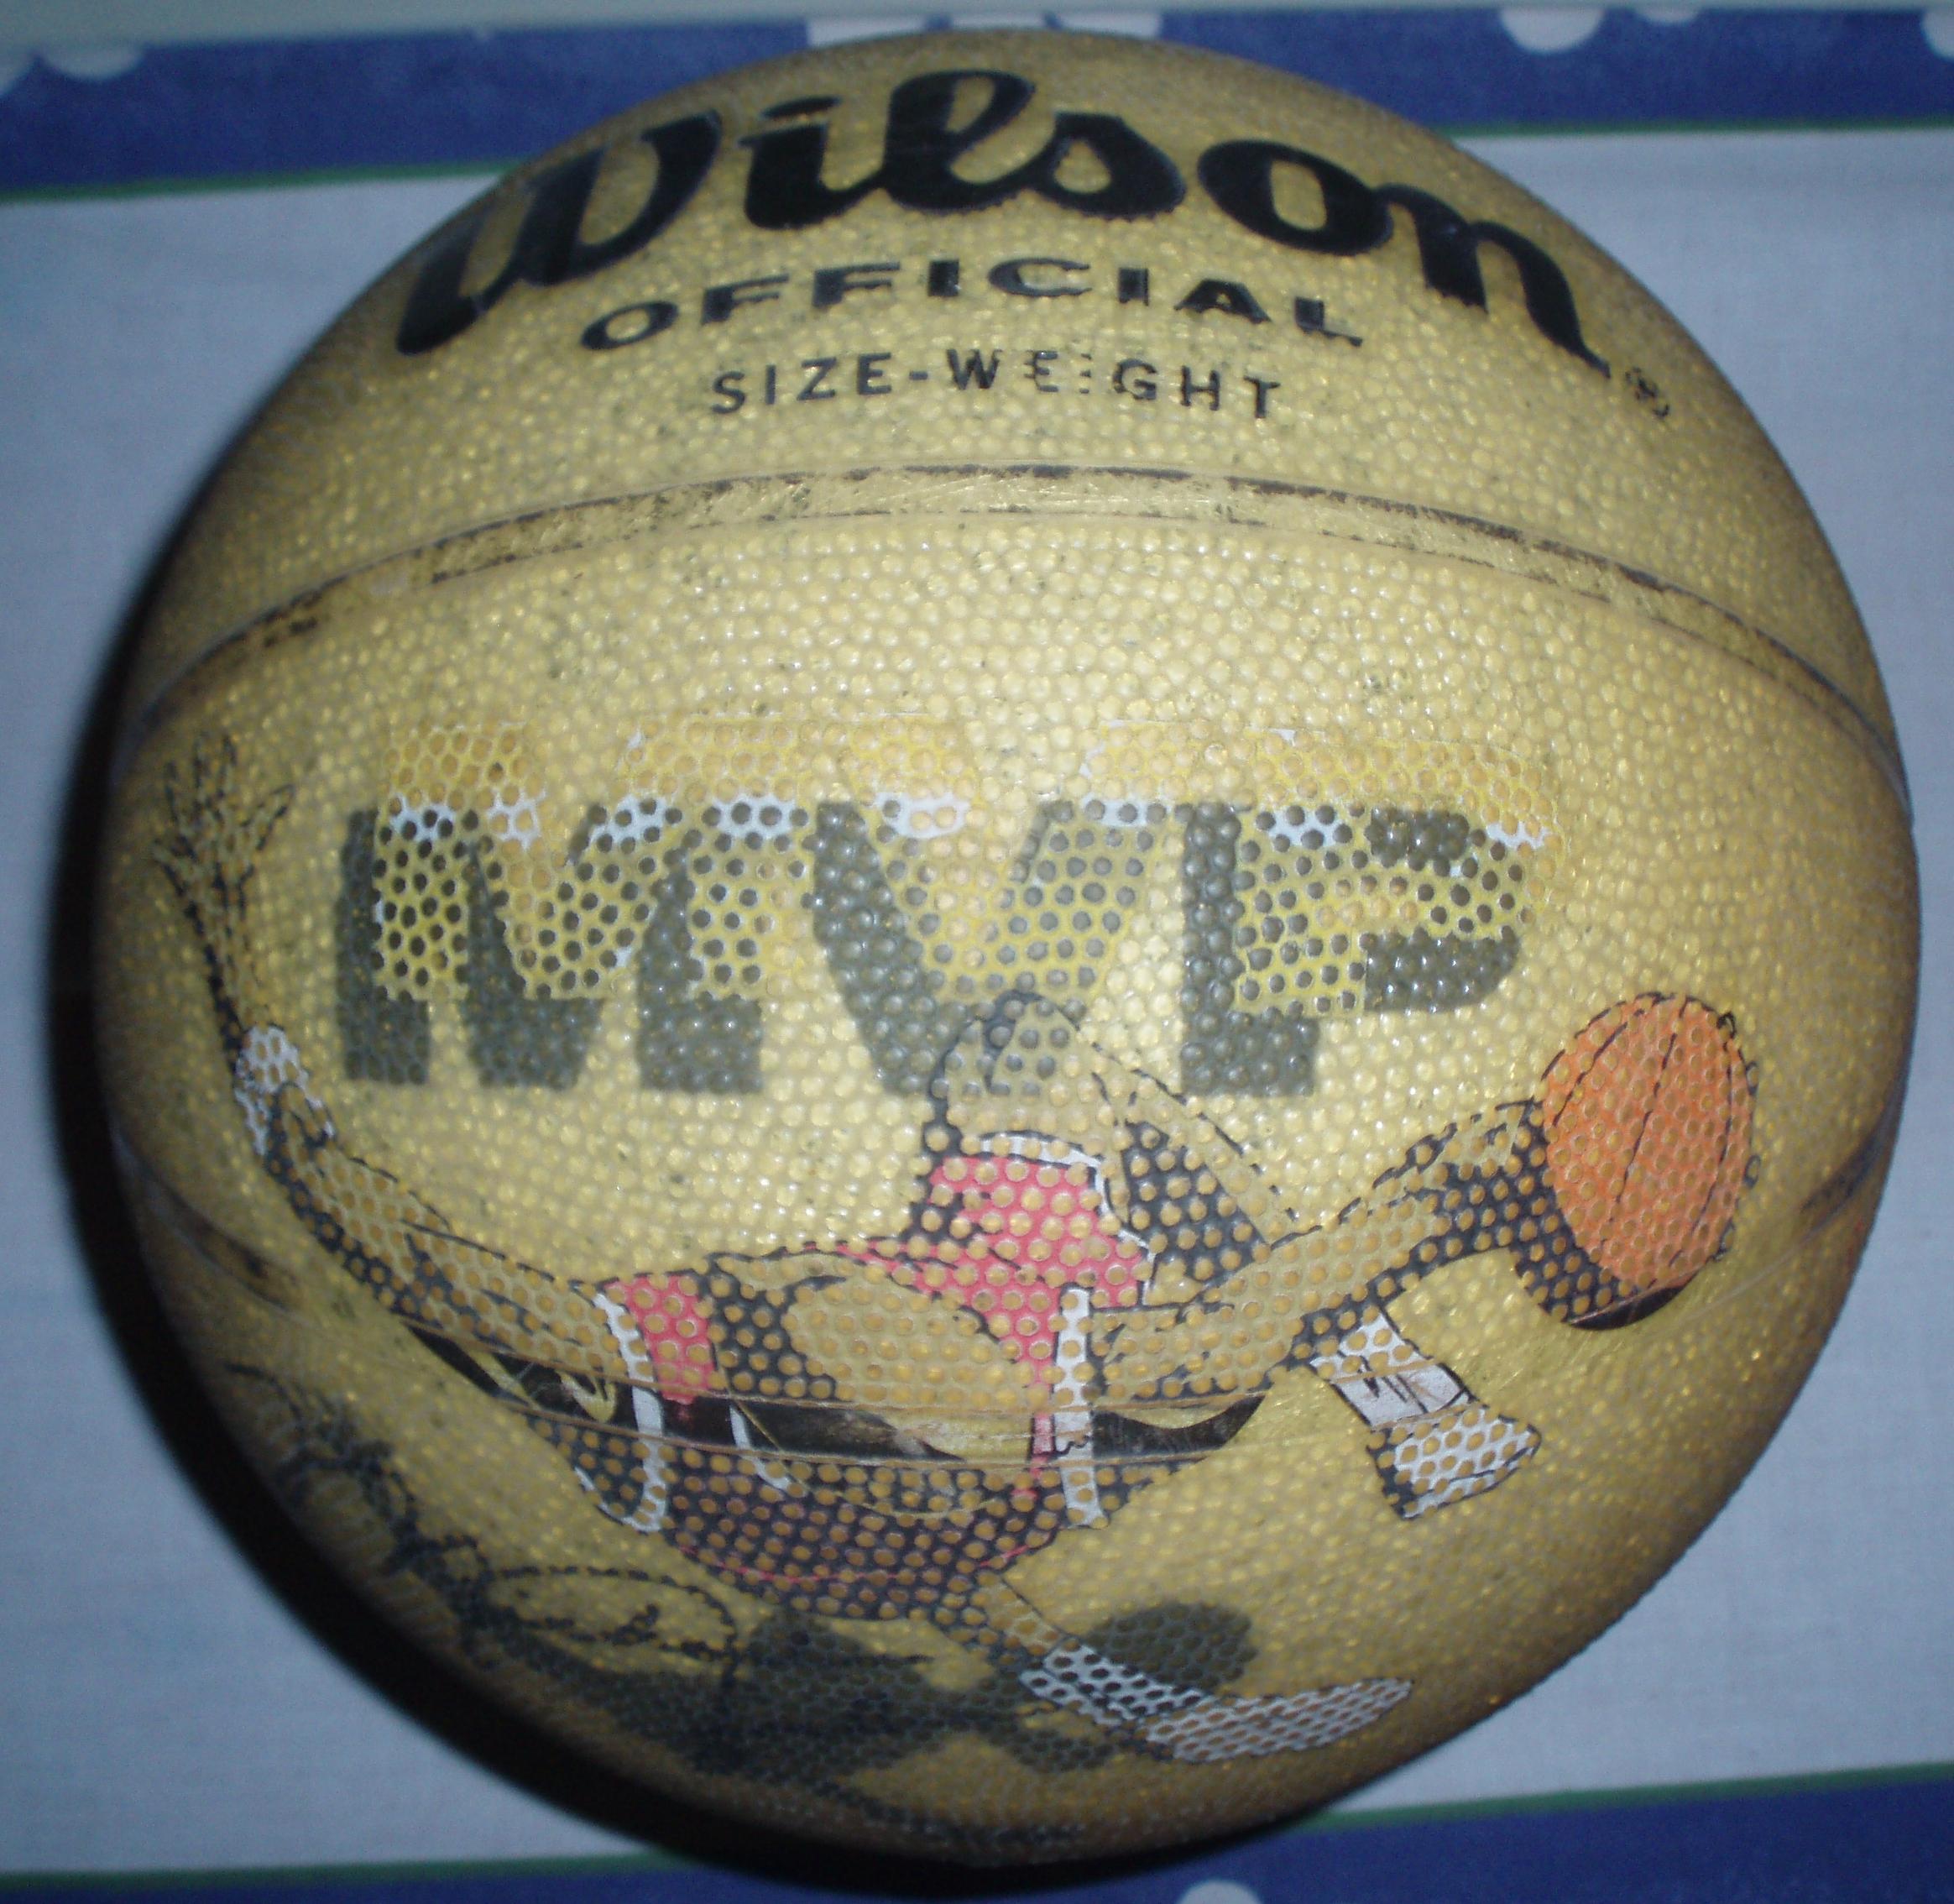 Баскетбольный мяч Larsen